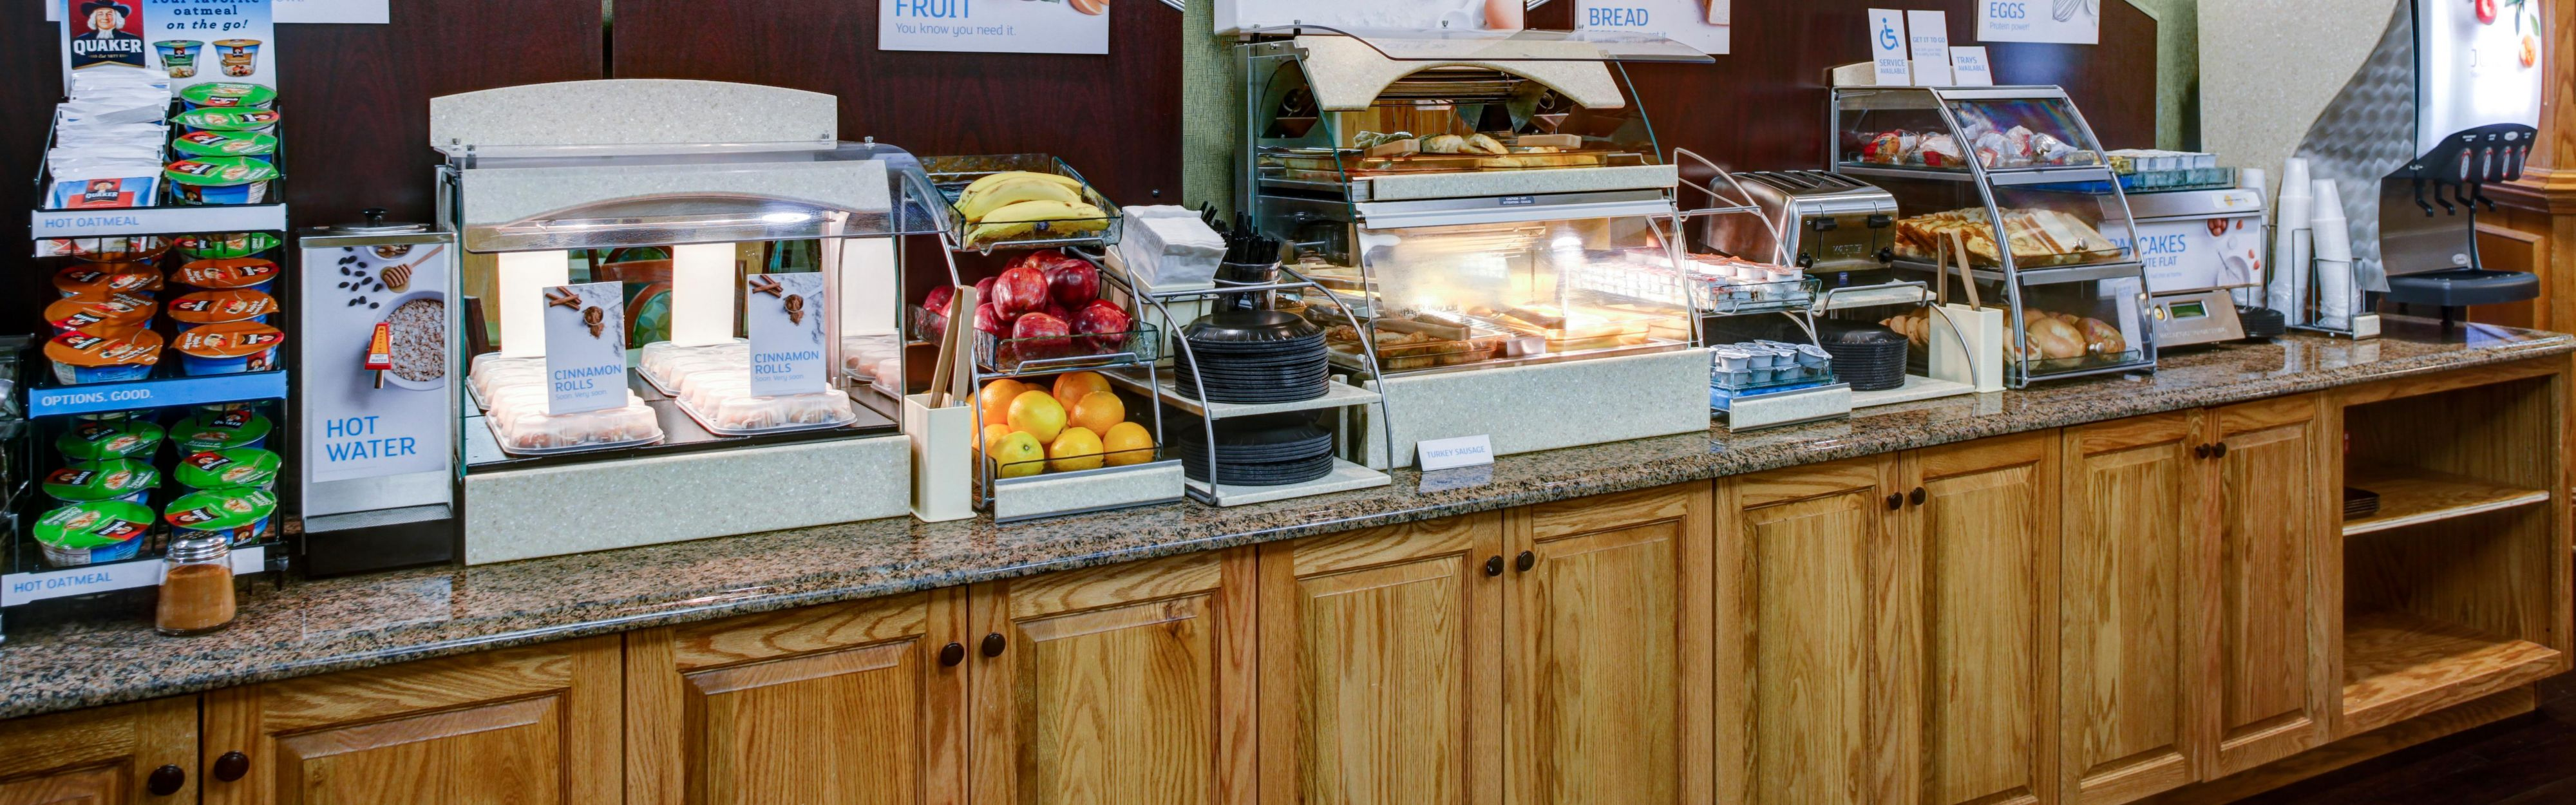 Holiday Inn Express & Suites Atlanta Buckhead image 3